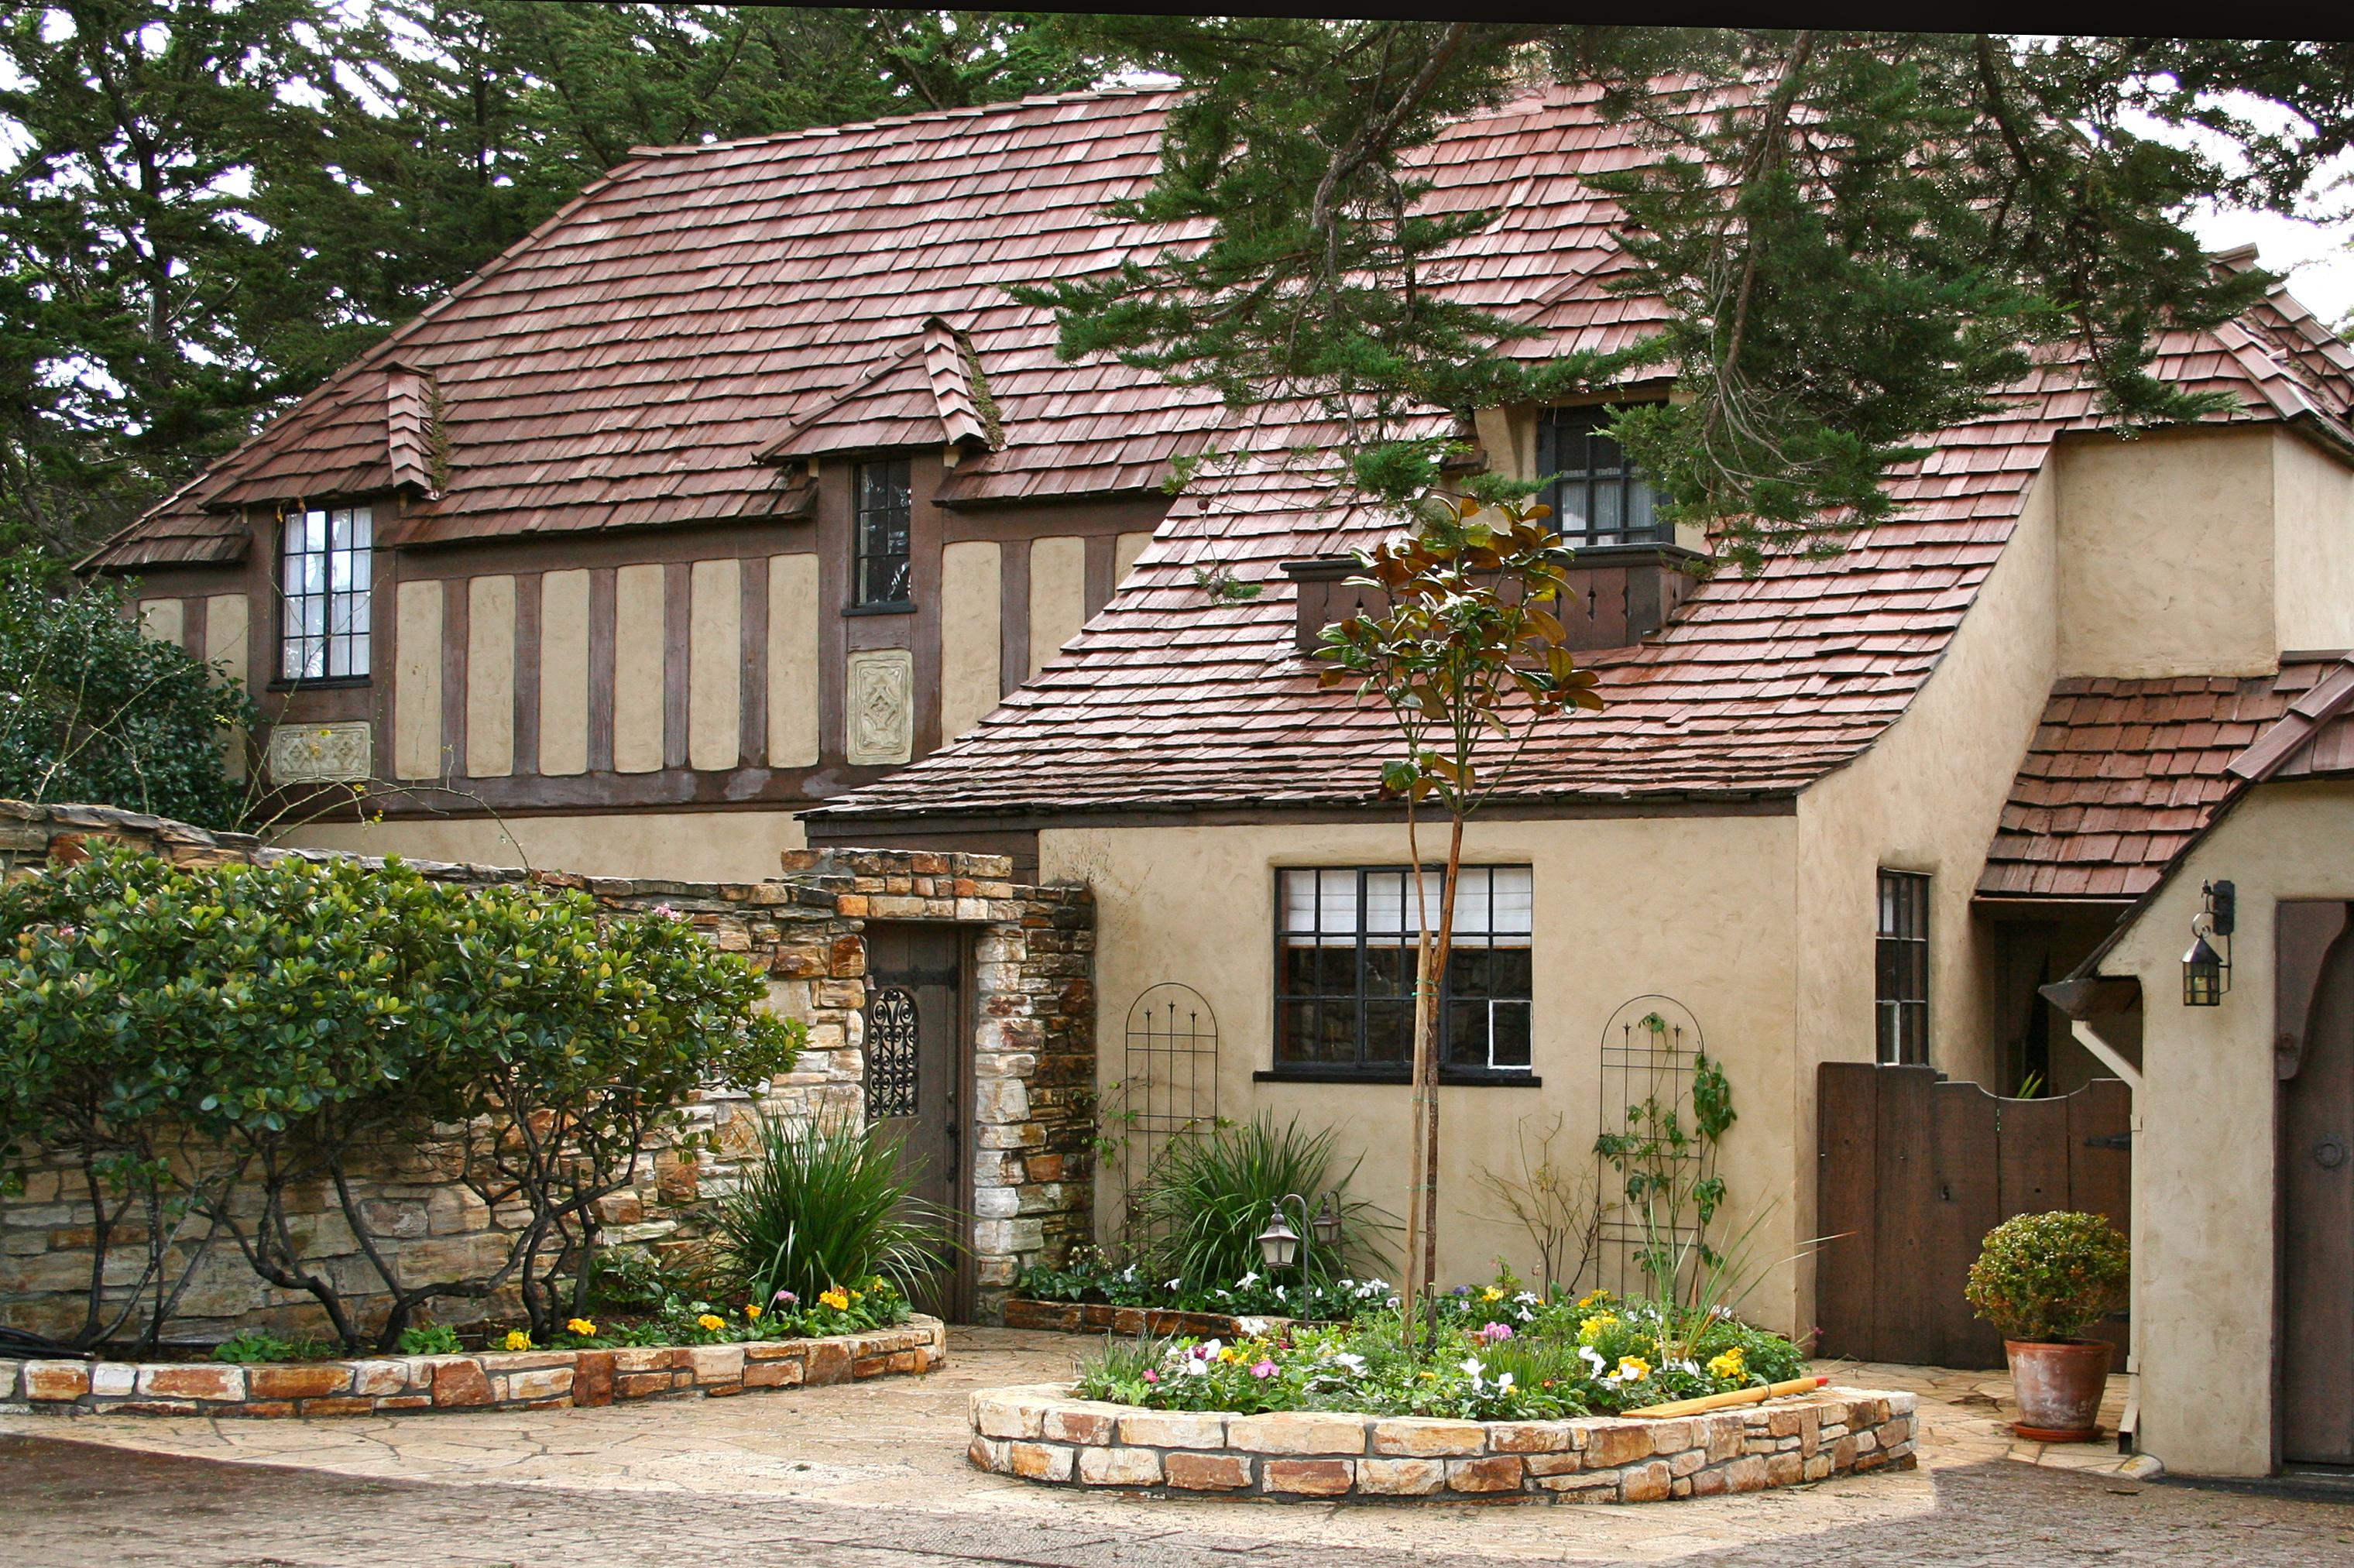 Hugh comstock builds a country manor house on carmel point for Carmel house